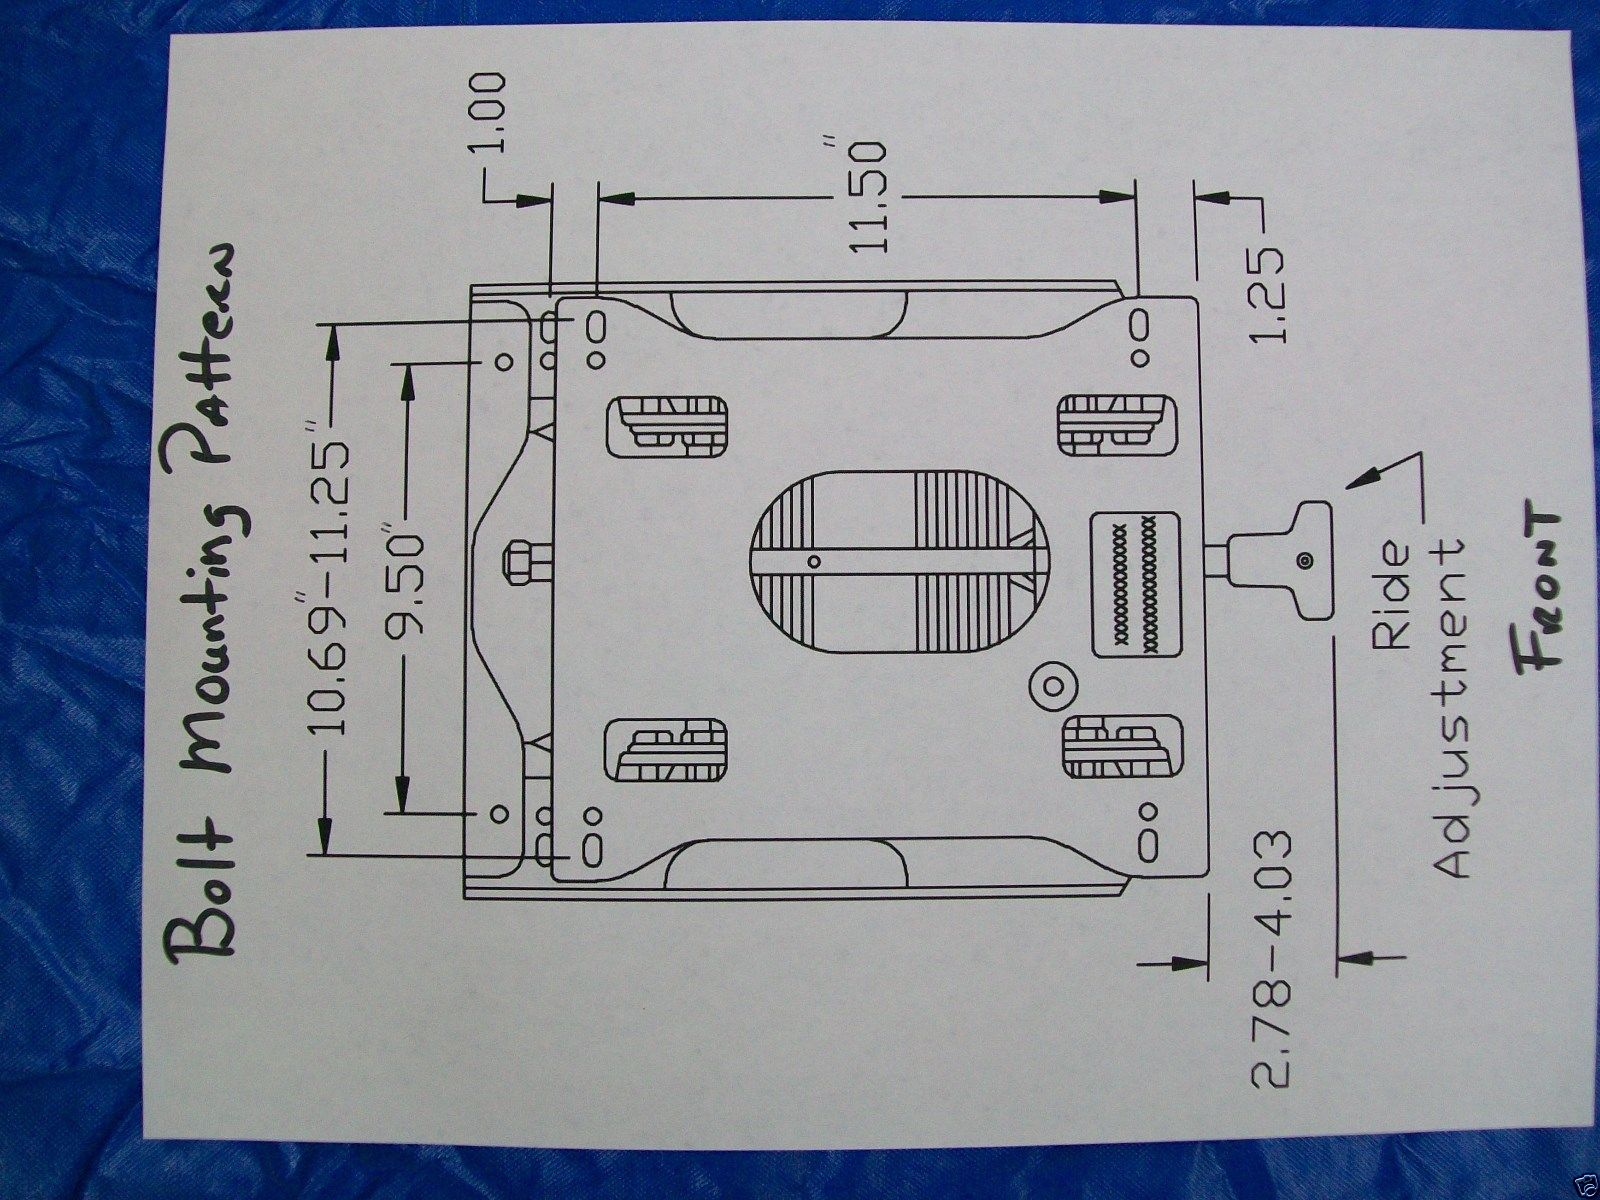 Toro Zero Turn Wiring Diagram Toro Free Engine Image For User Manual